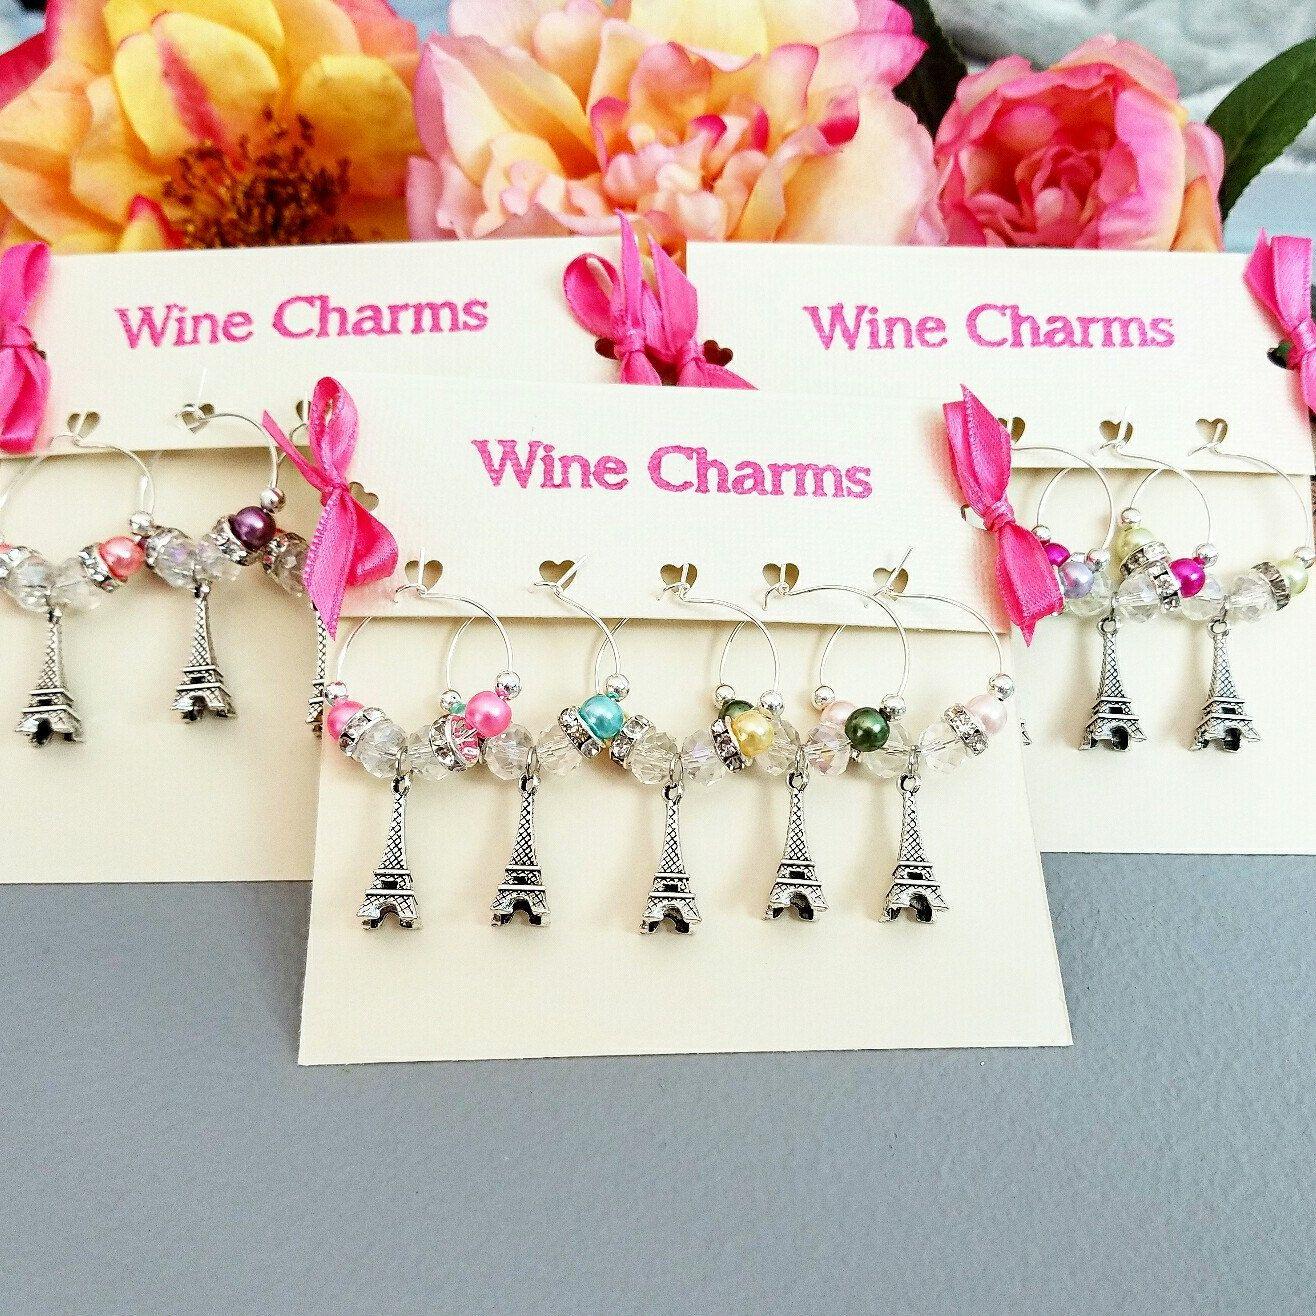 5 Paris Wine Glass Charms Paris Theme Favors Pink Wine Charms/ Wine ...